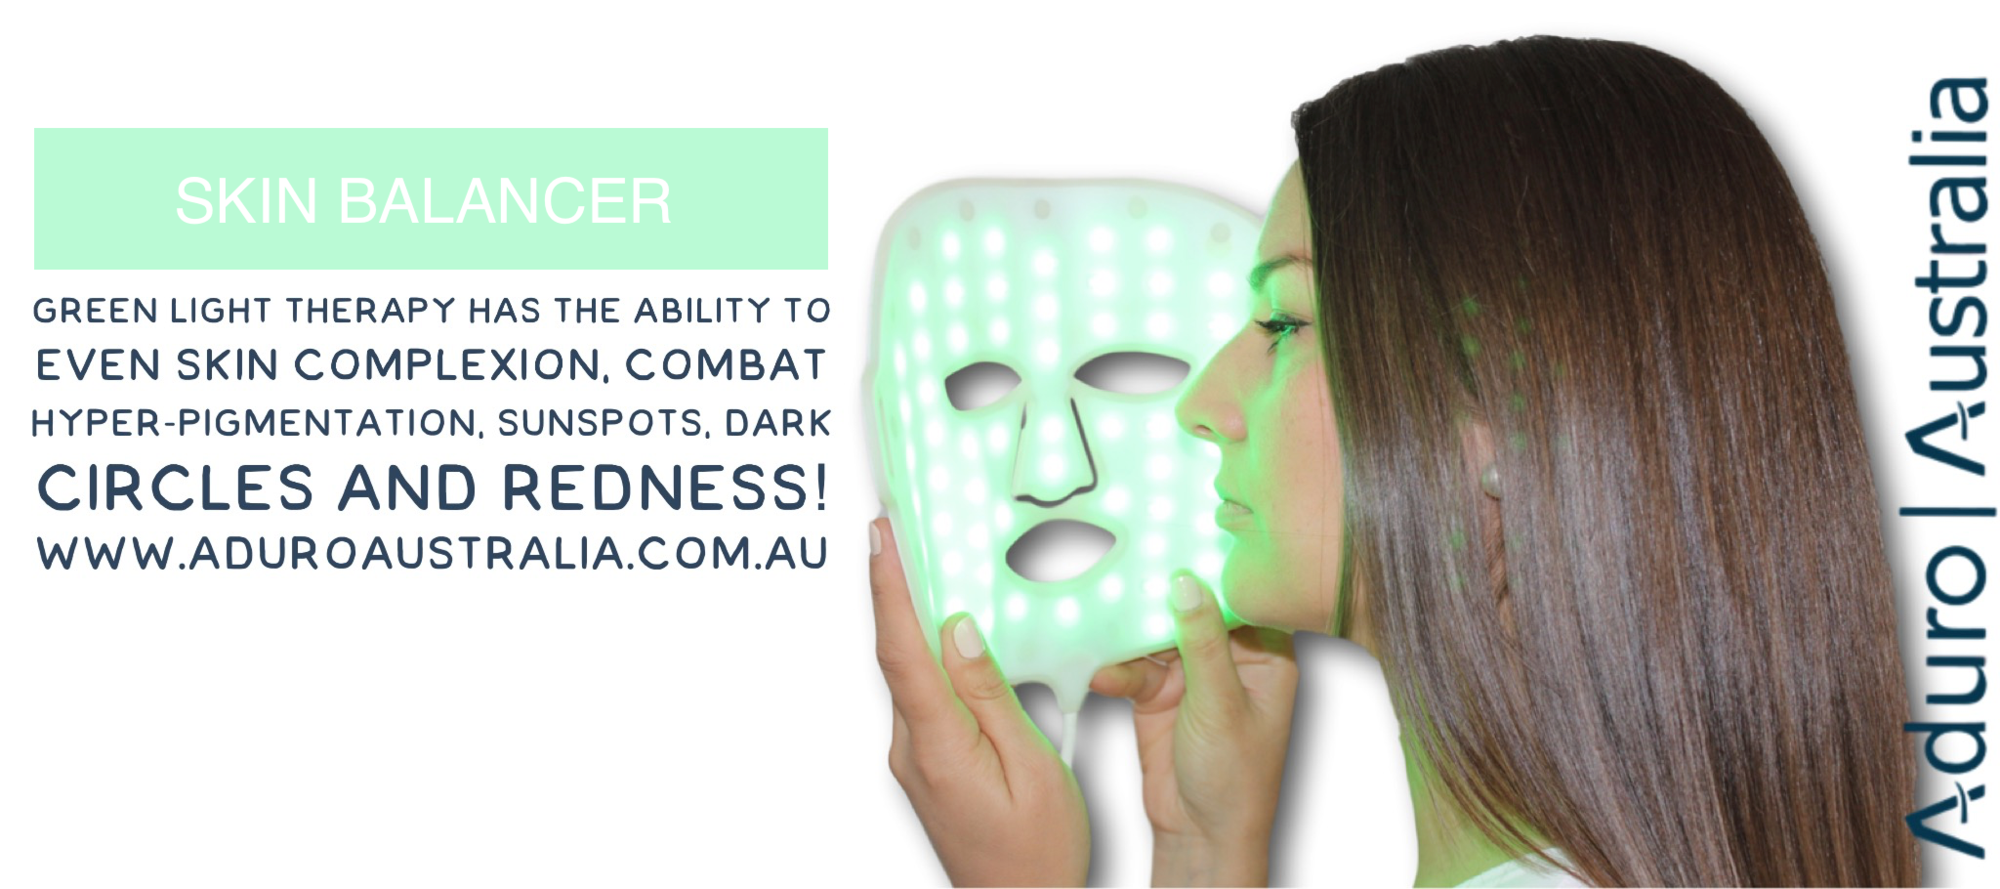 Personal LED MASK - Aduro Australia